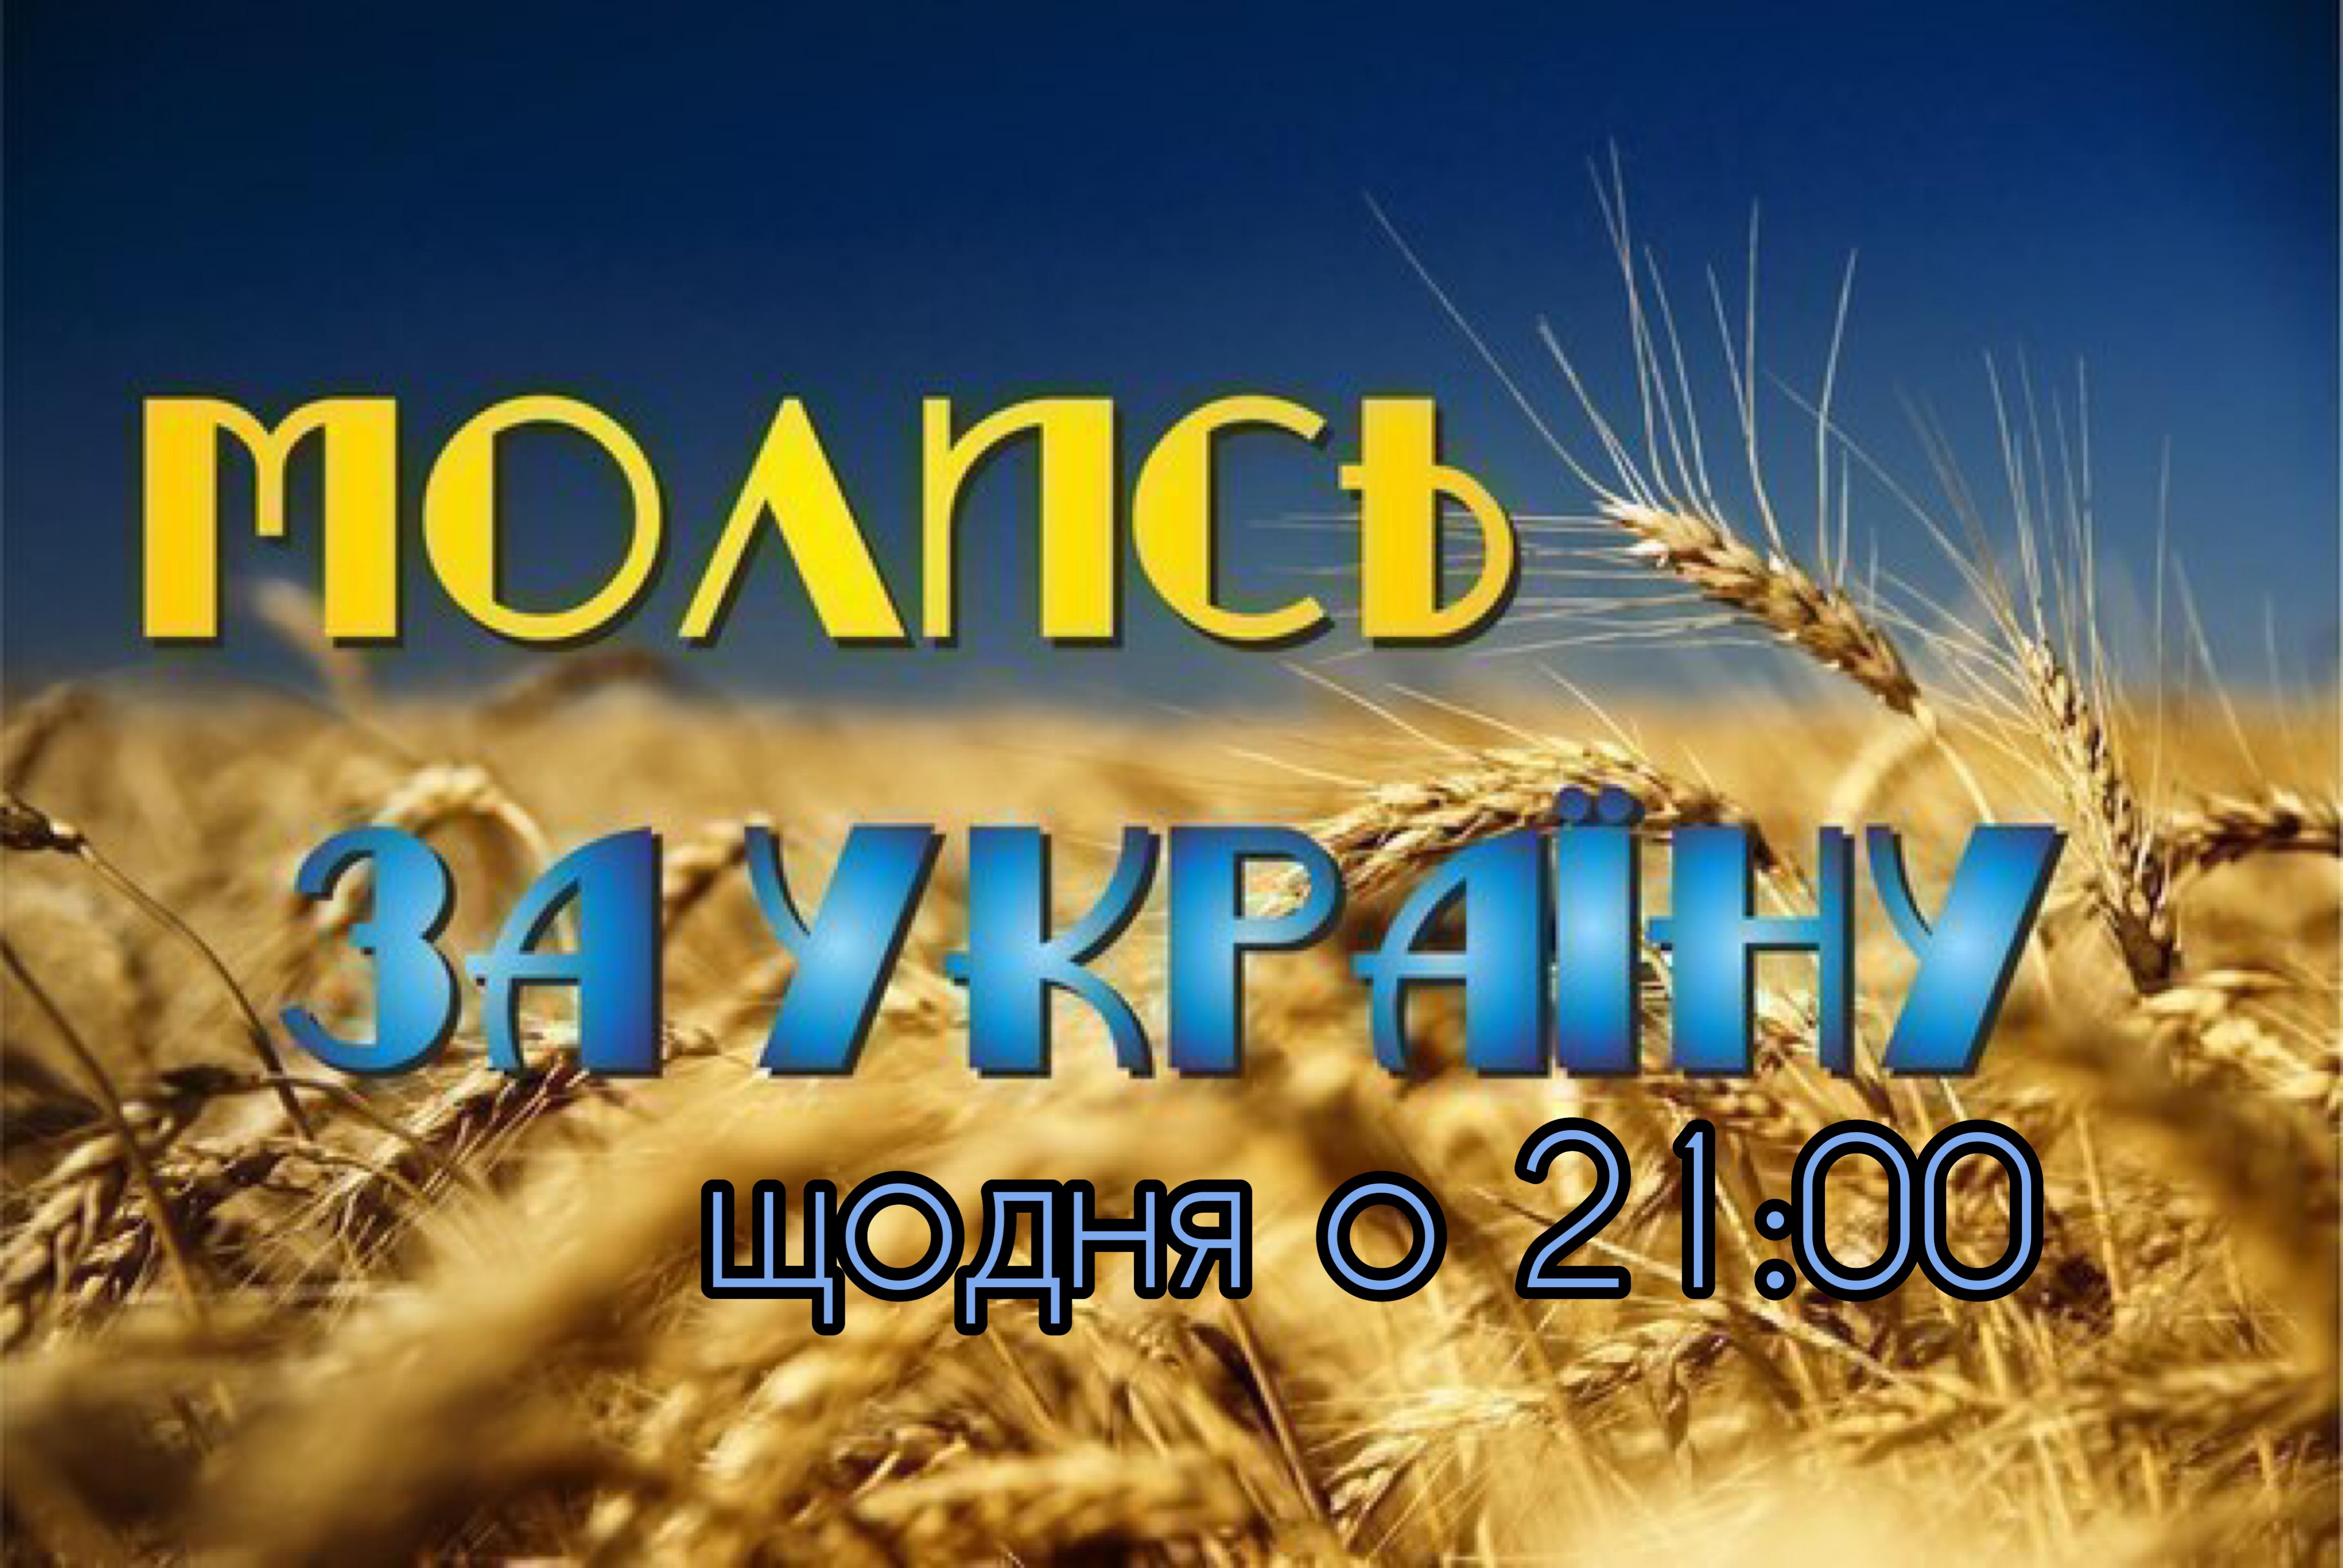 Молись за Україну!